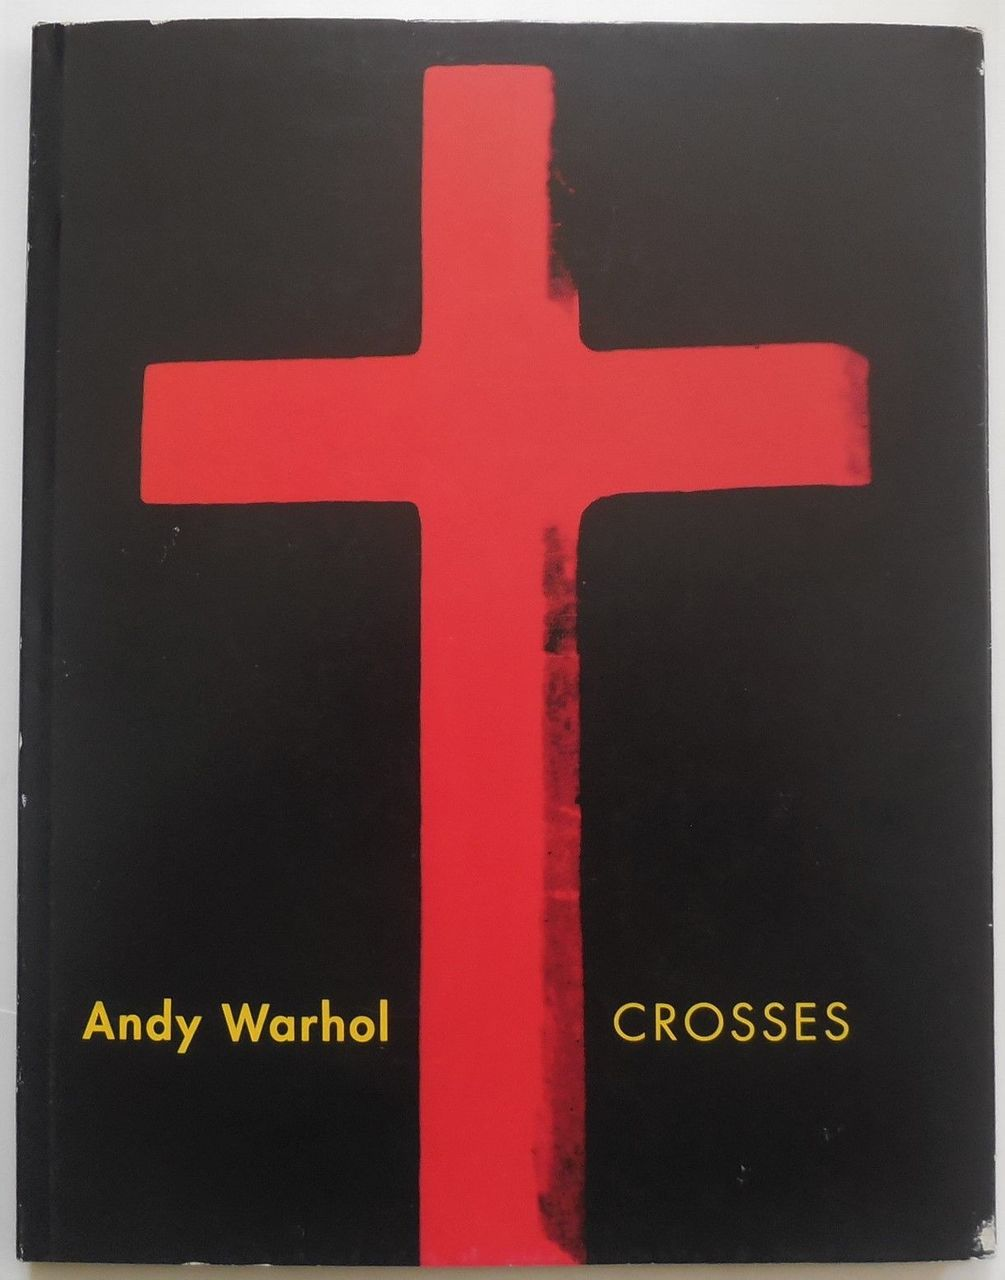 ANDY WARHOL: CROSSES - 1999